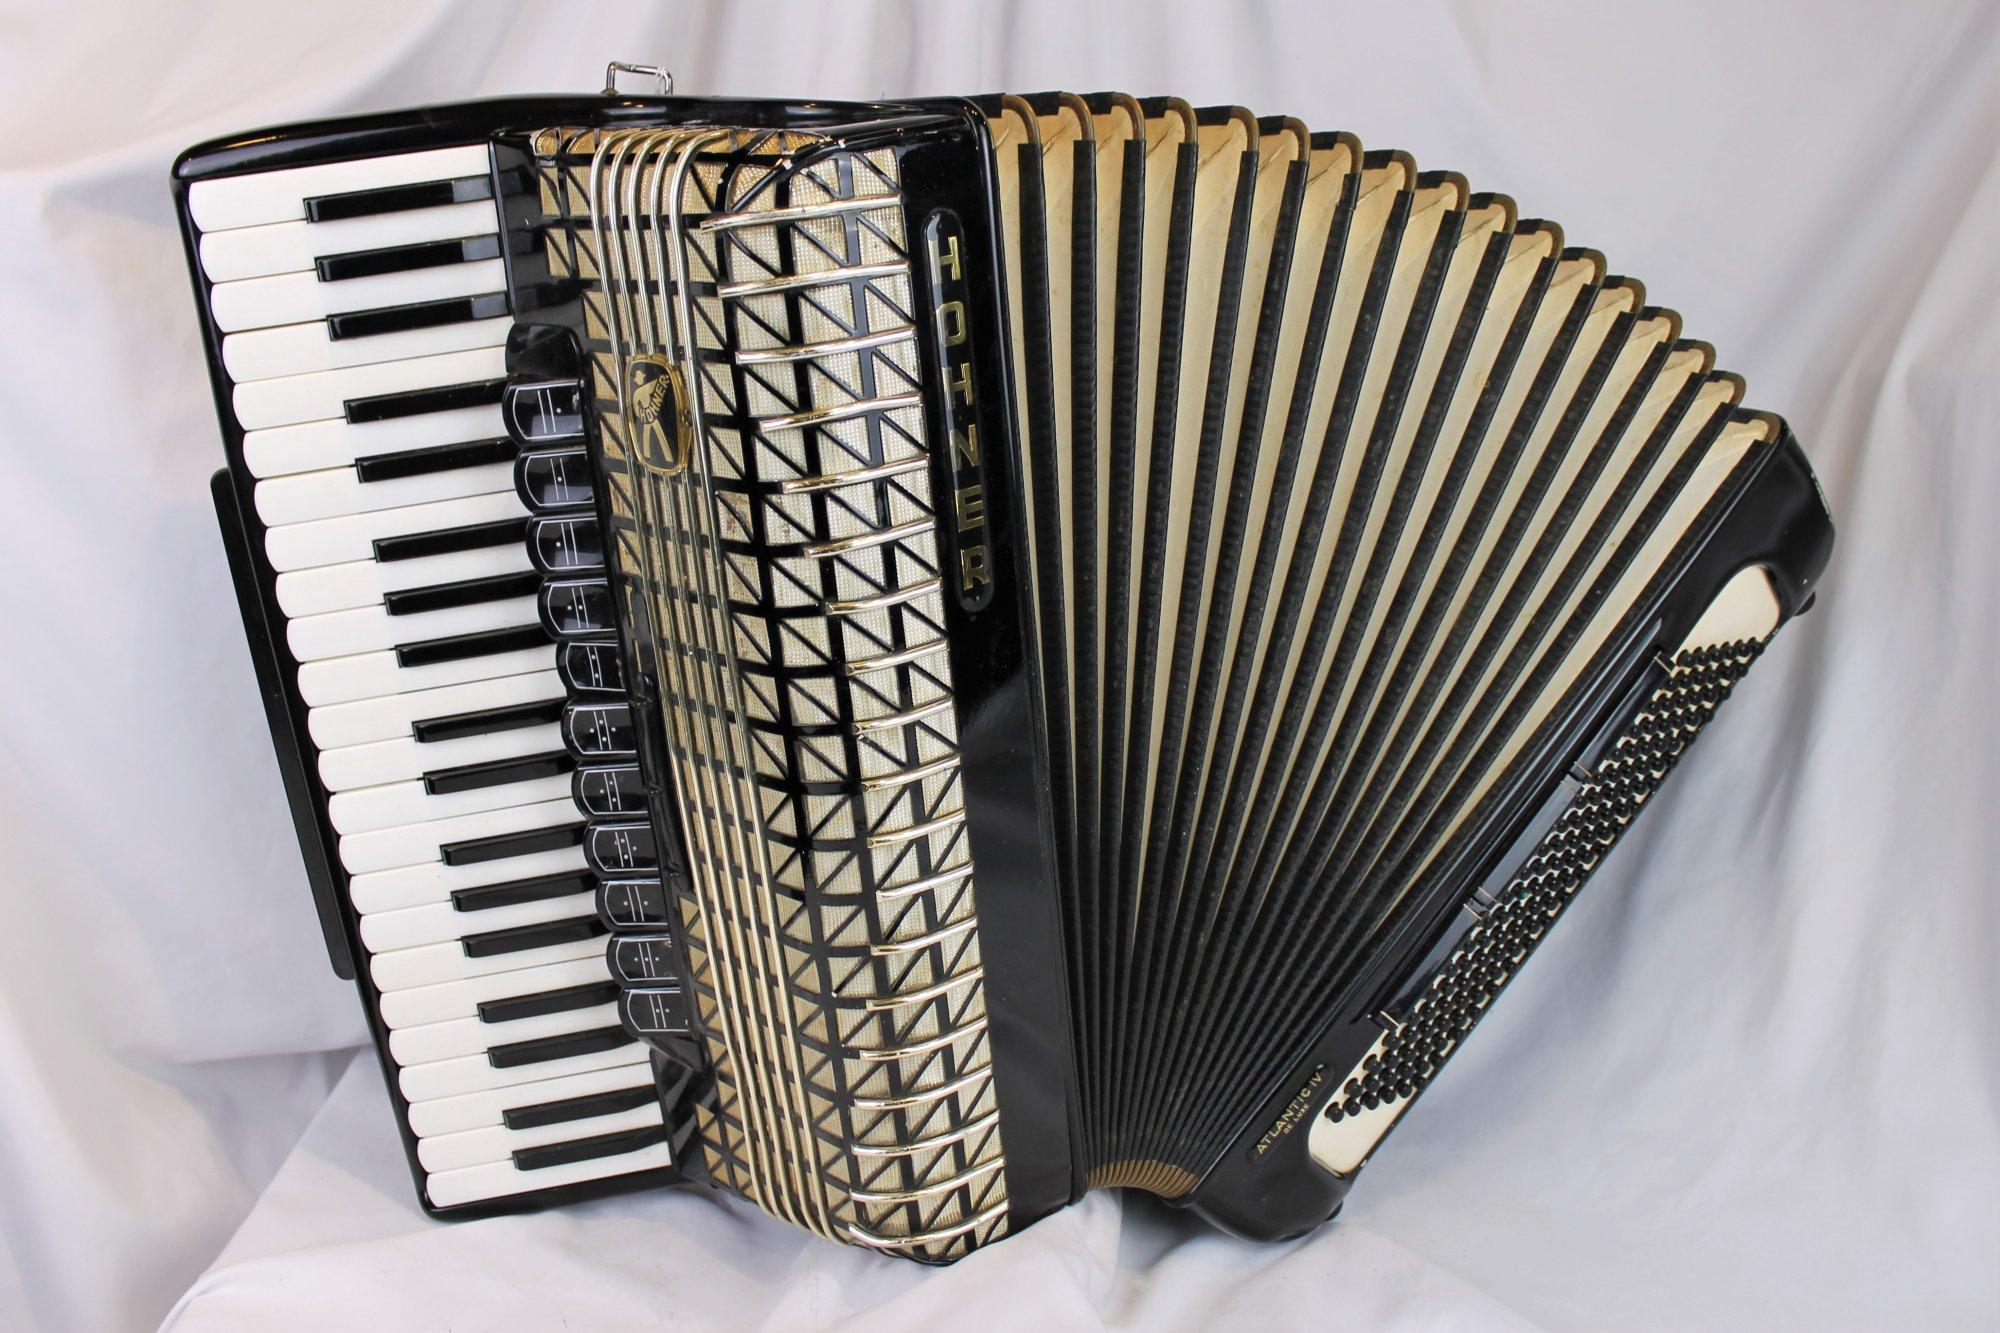 4582 - Black Hohner Atlantic IV De Luxe Piano Accordion LMMH 41 120